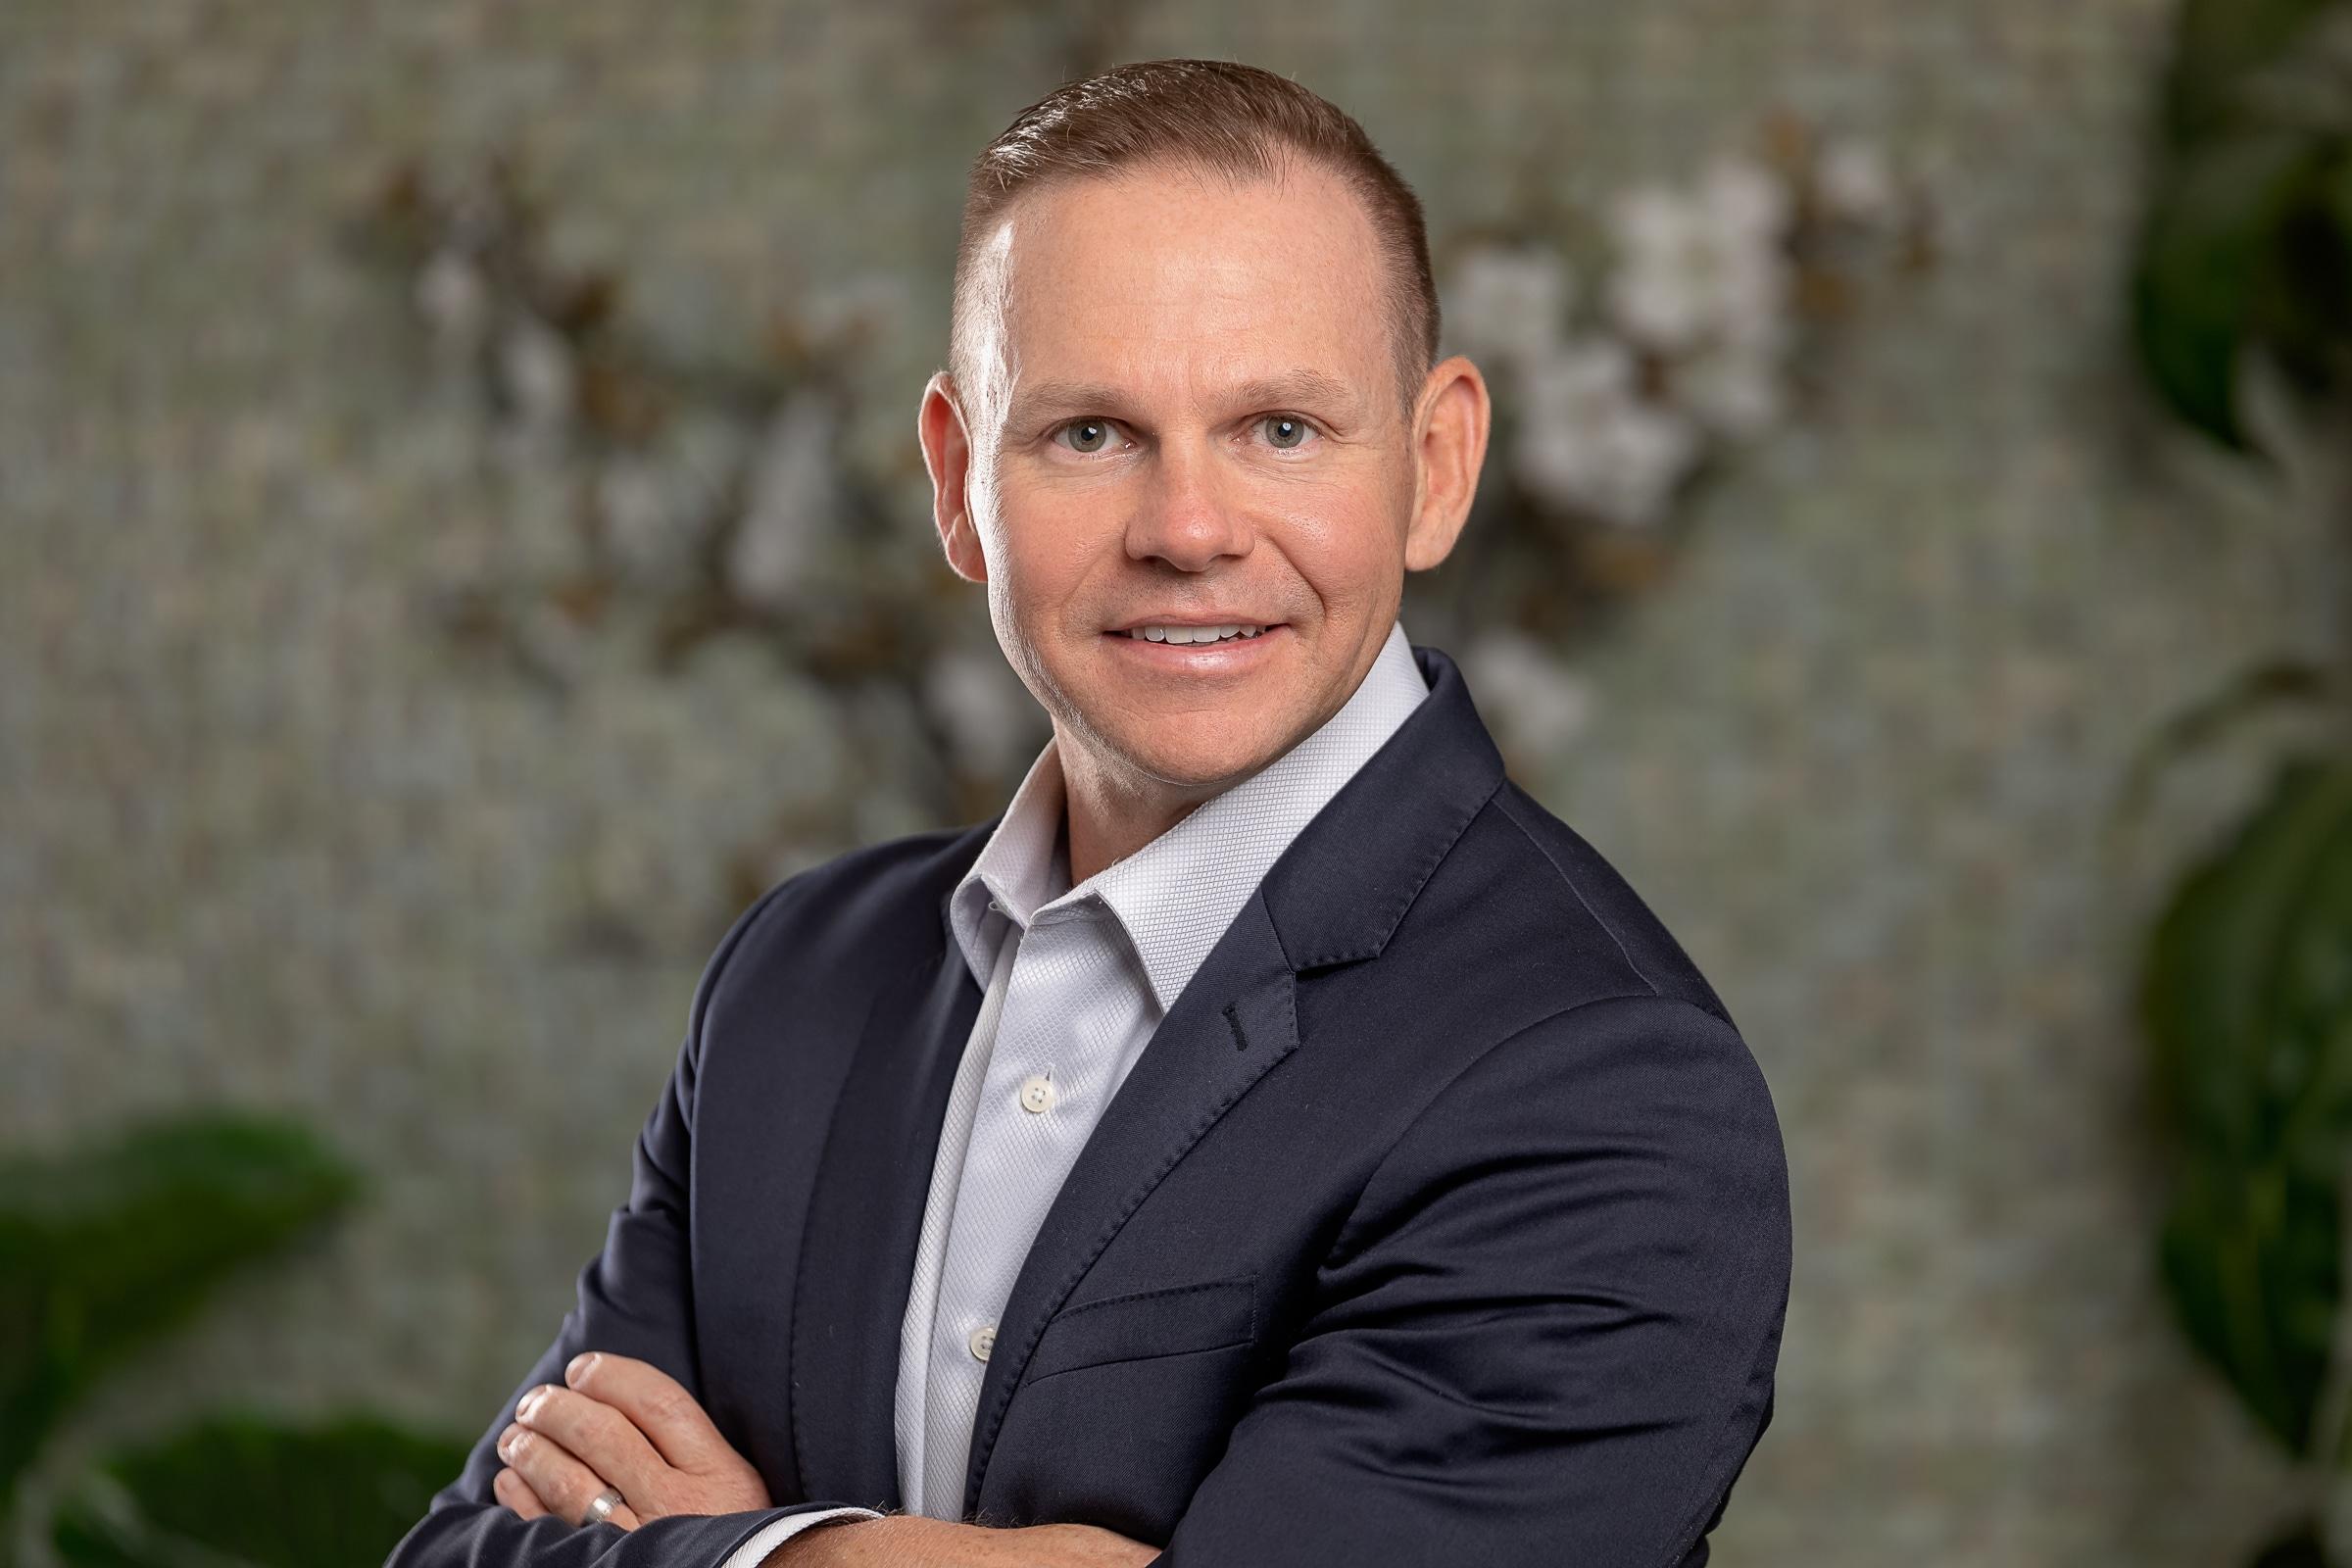 StephenDurrettNational Sales Director Altus Biologics